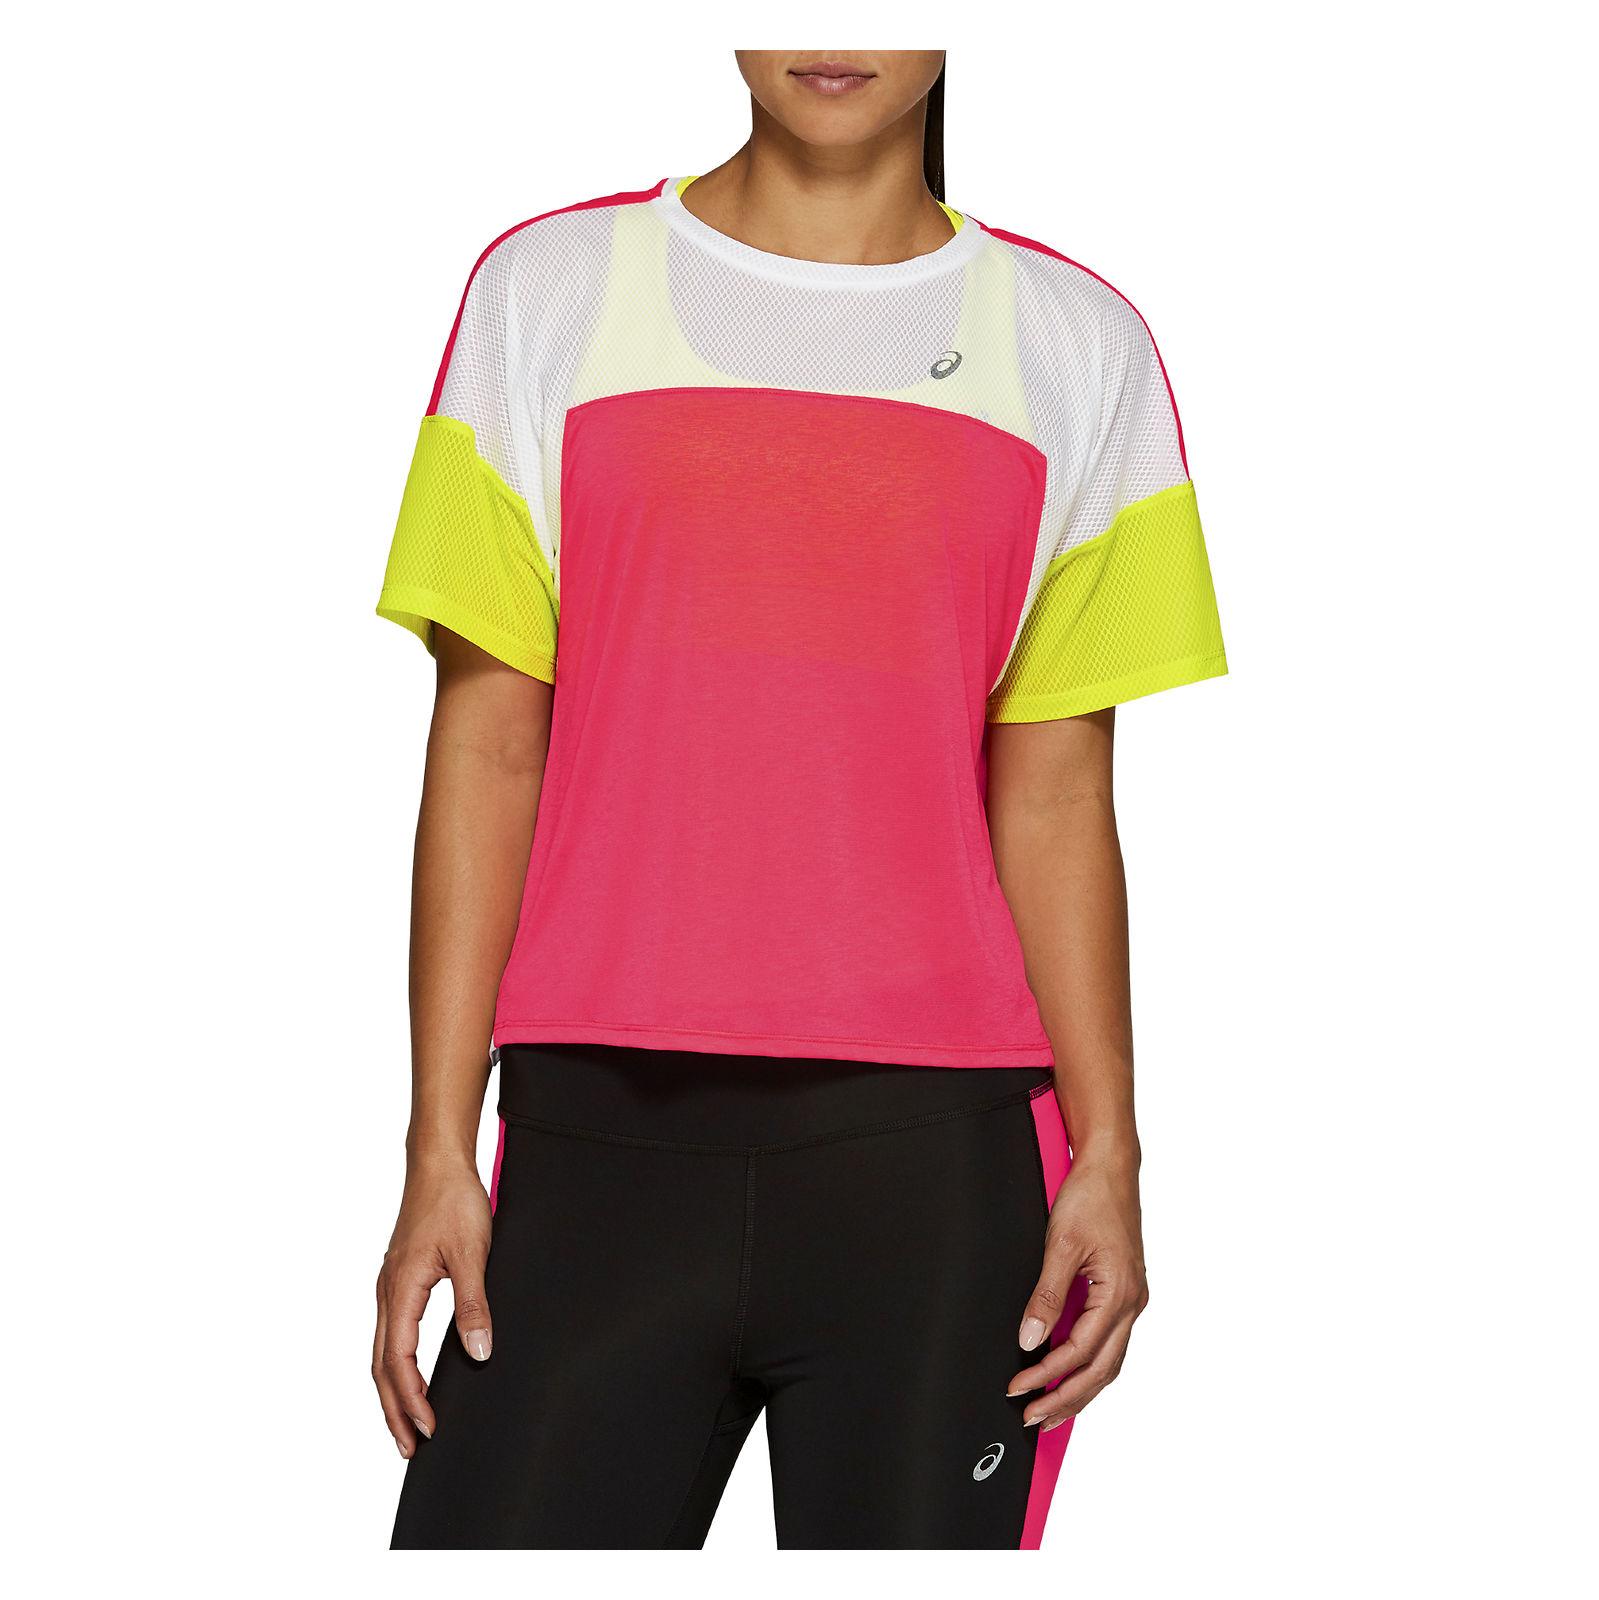 Koszulka damska do biegania Asics Style Top 2012A269